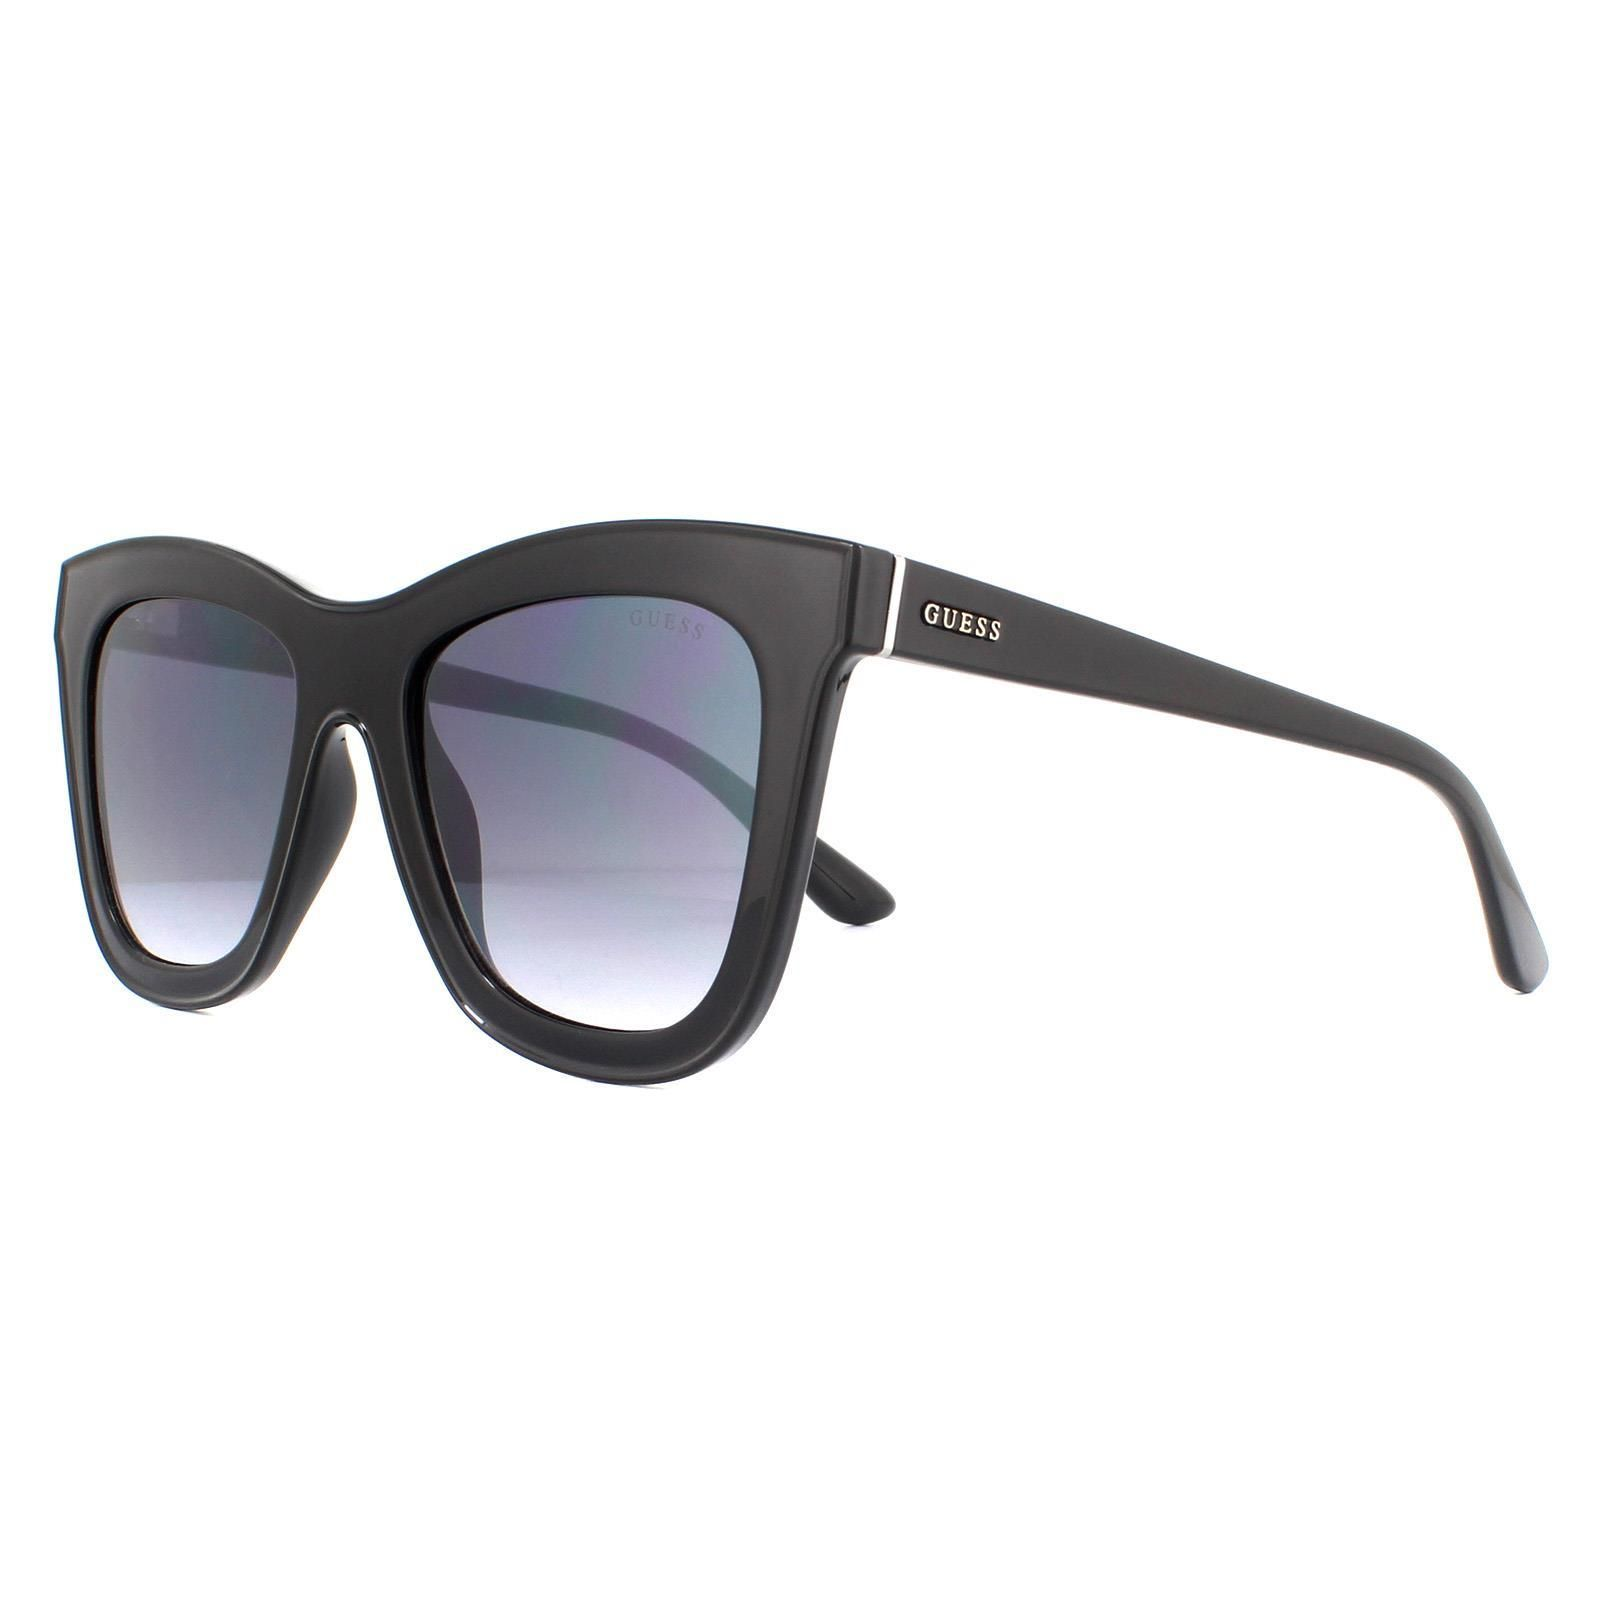 Guess Sunglasses GU7526 01B Shiny Black Grey Gradient